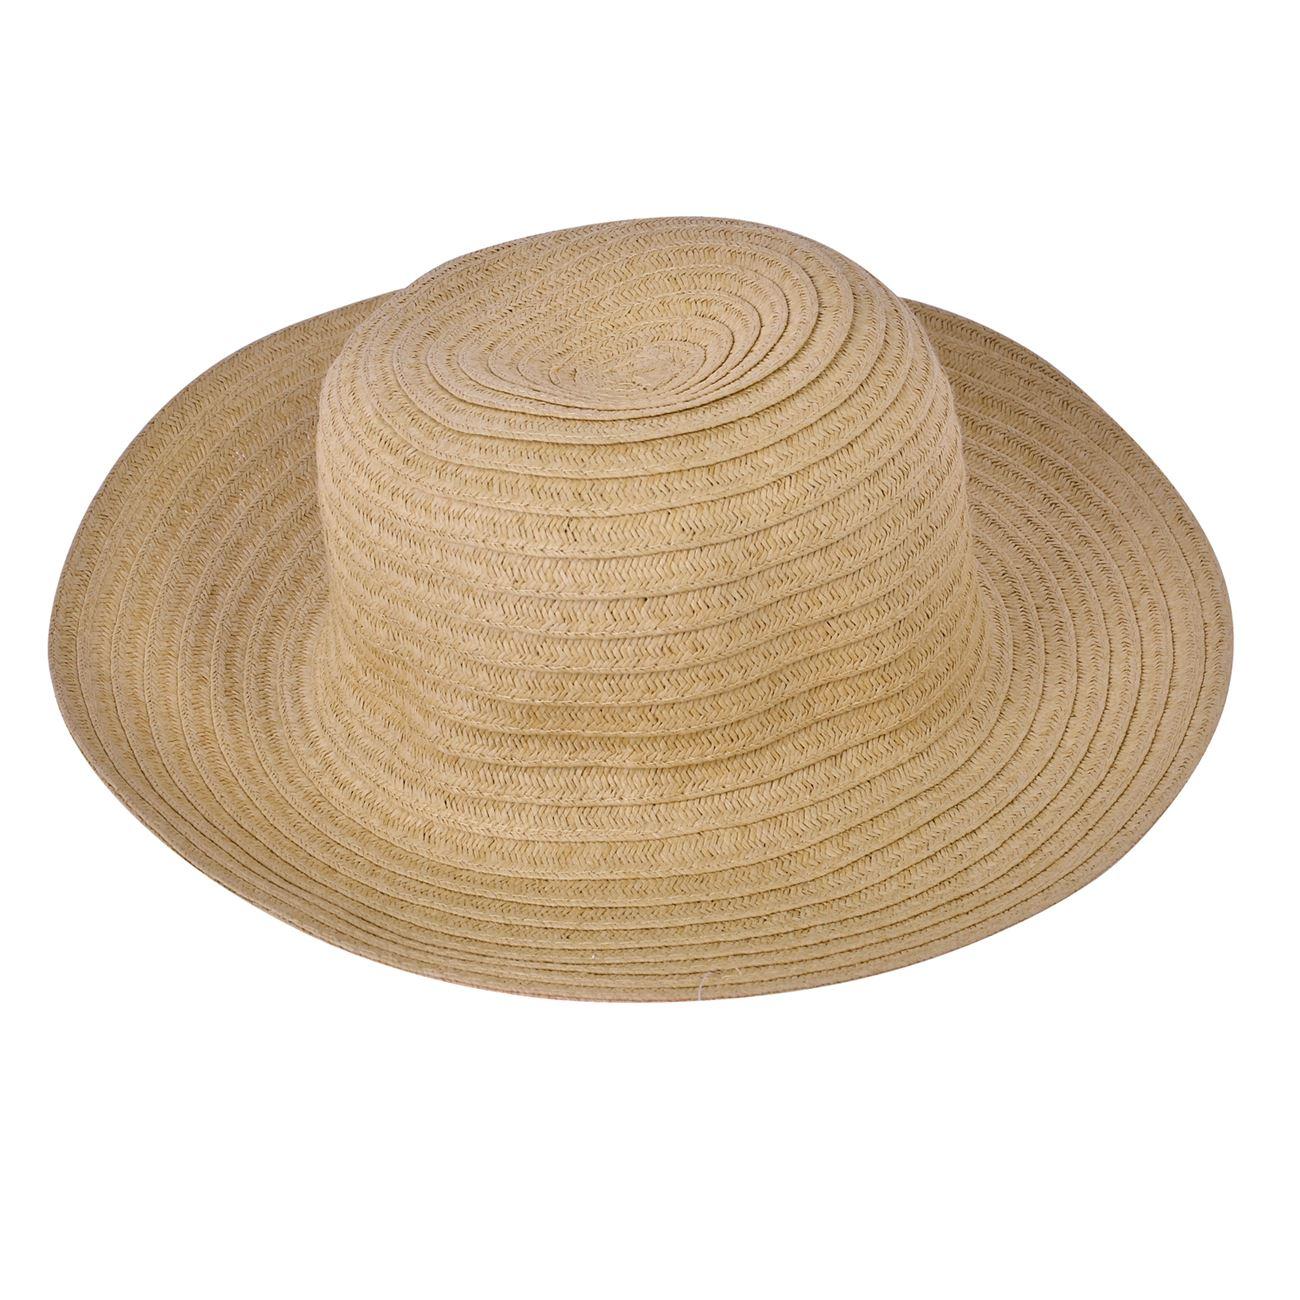 549894ef3f Καπέλο Γυναικείο Μπεζ   Καπέλα Ψάθινα Γυναικεία